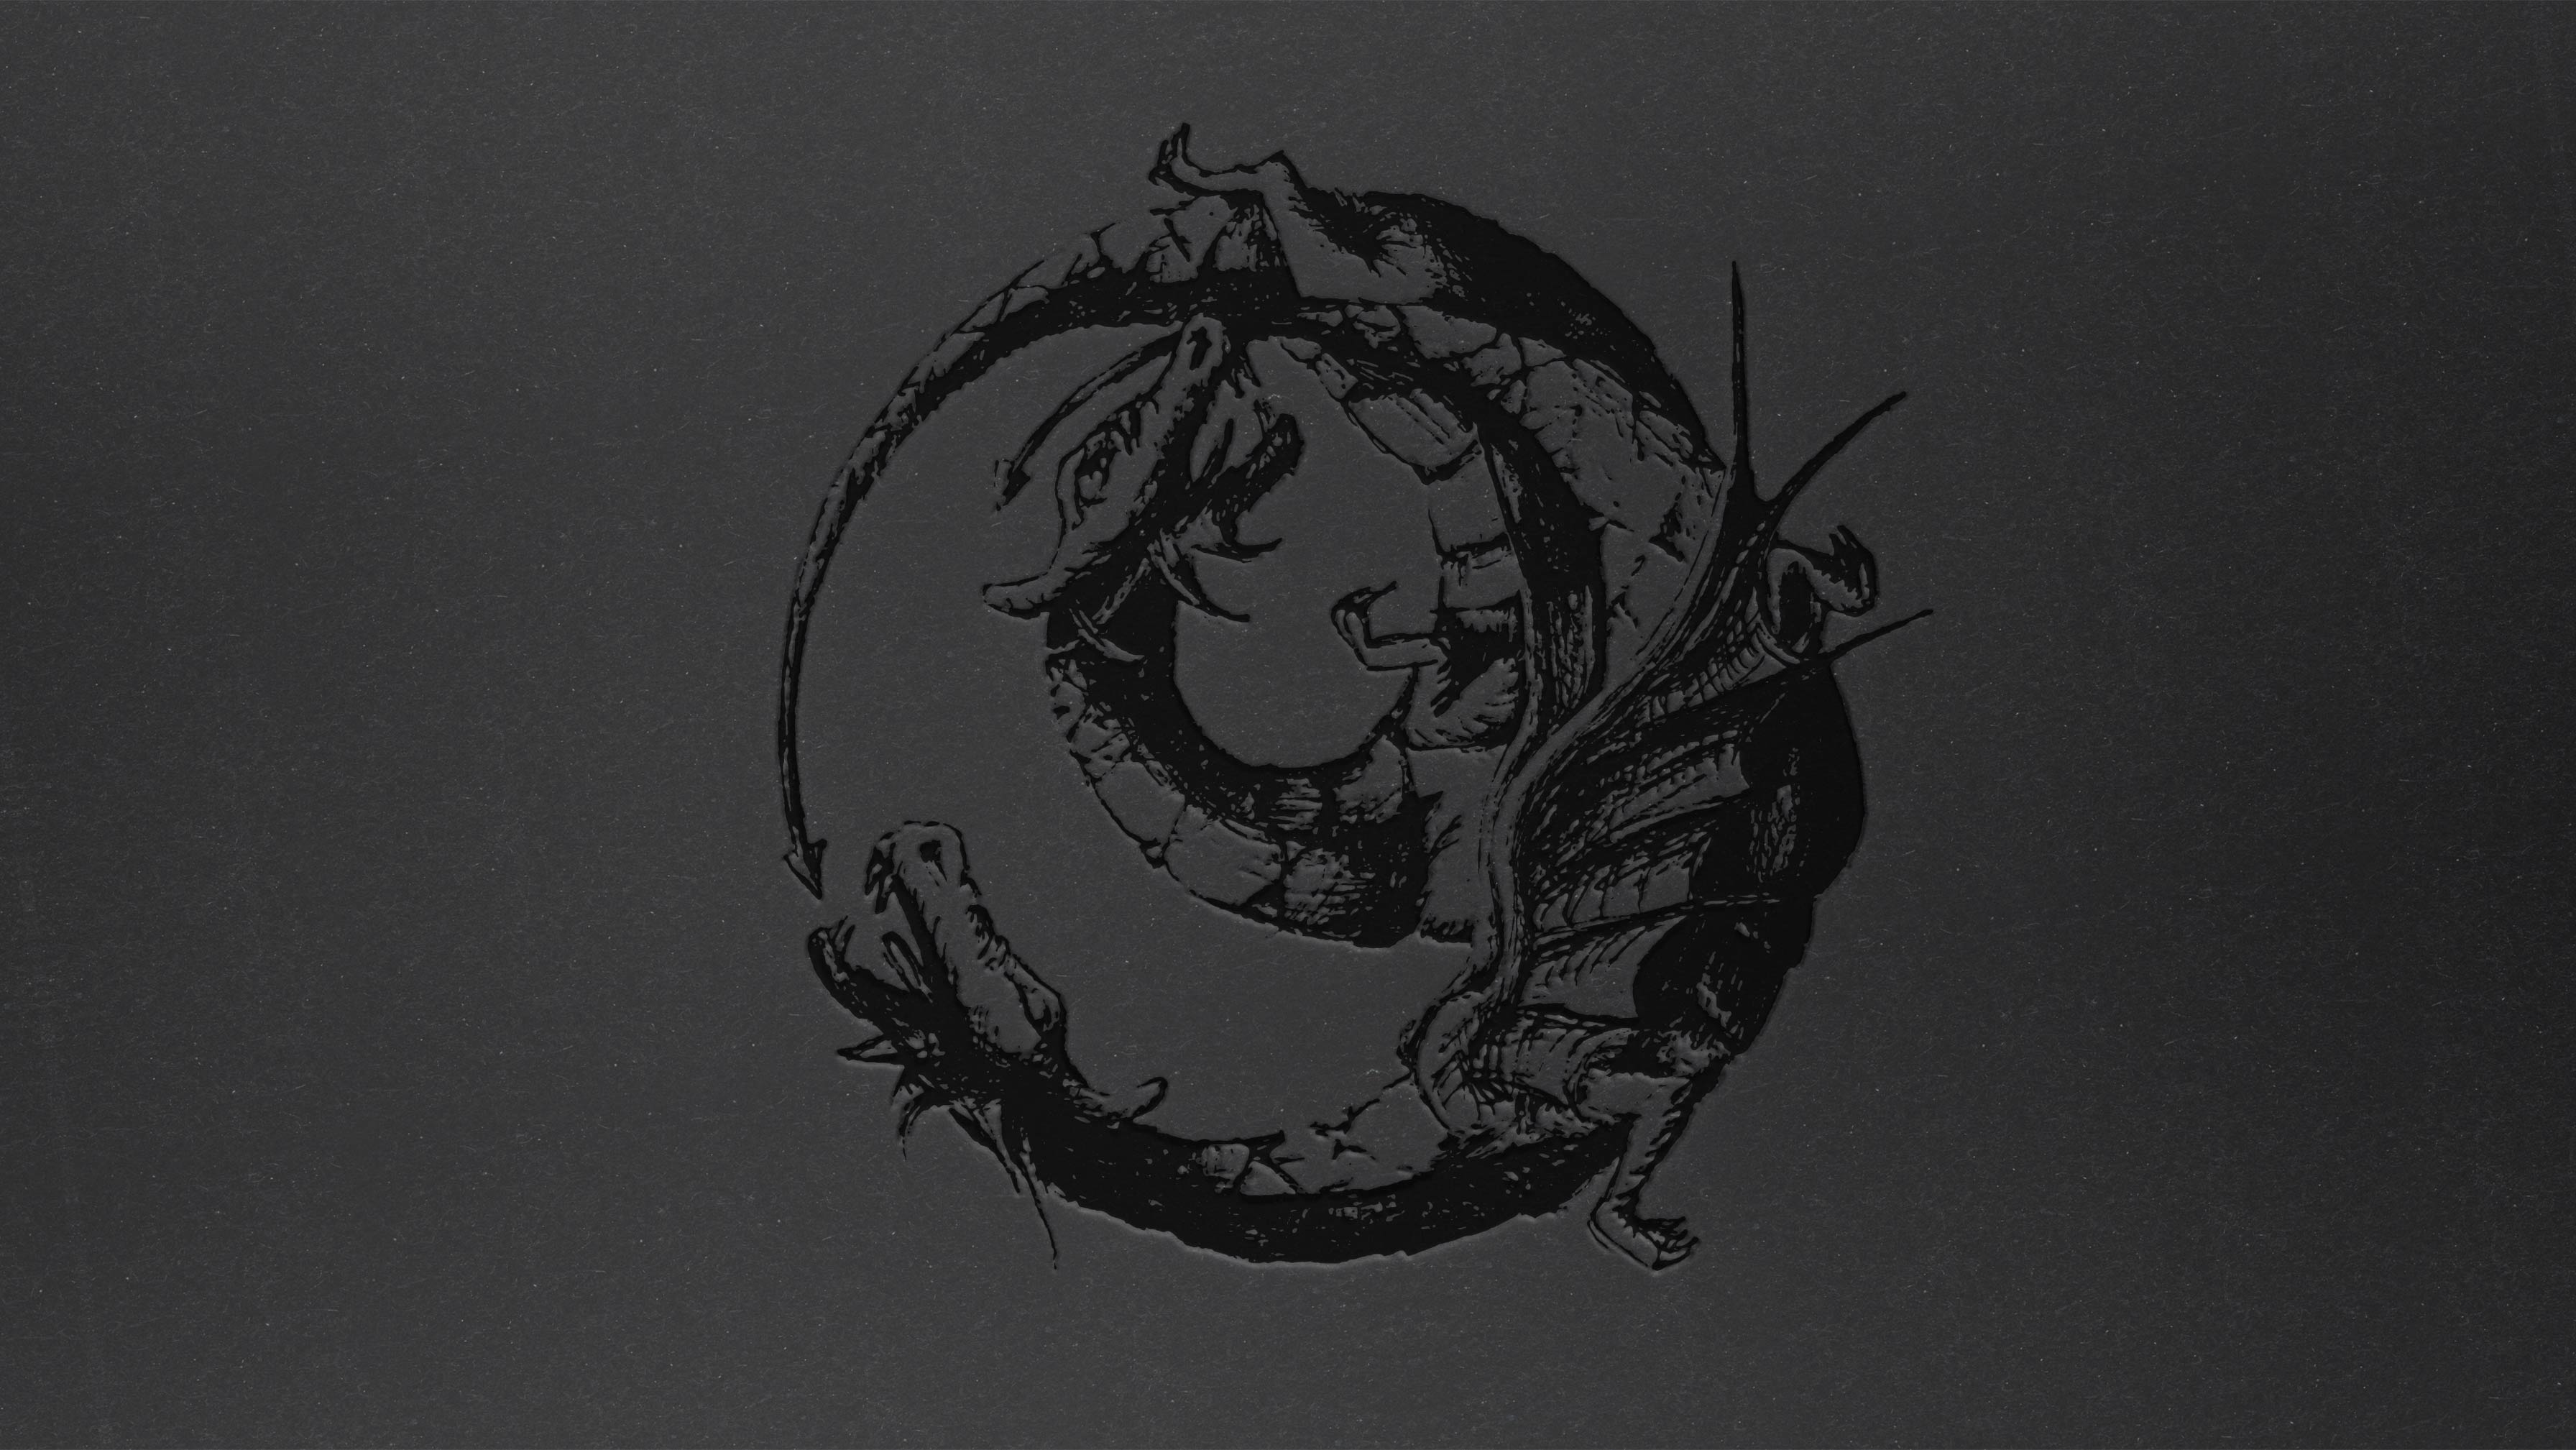 House of Reptile - Symbol